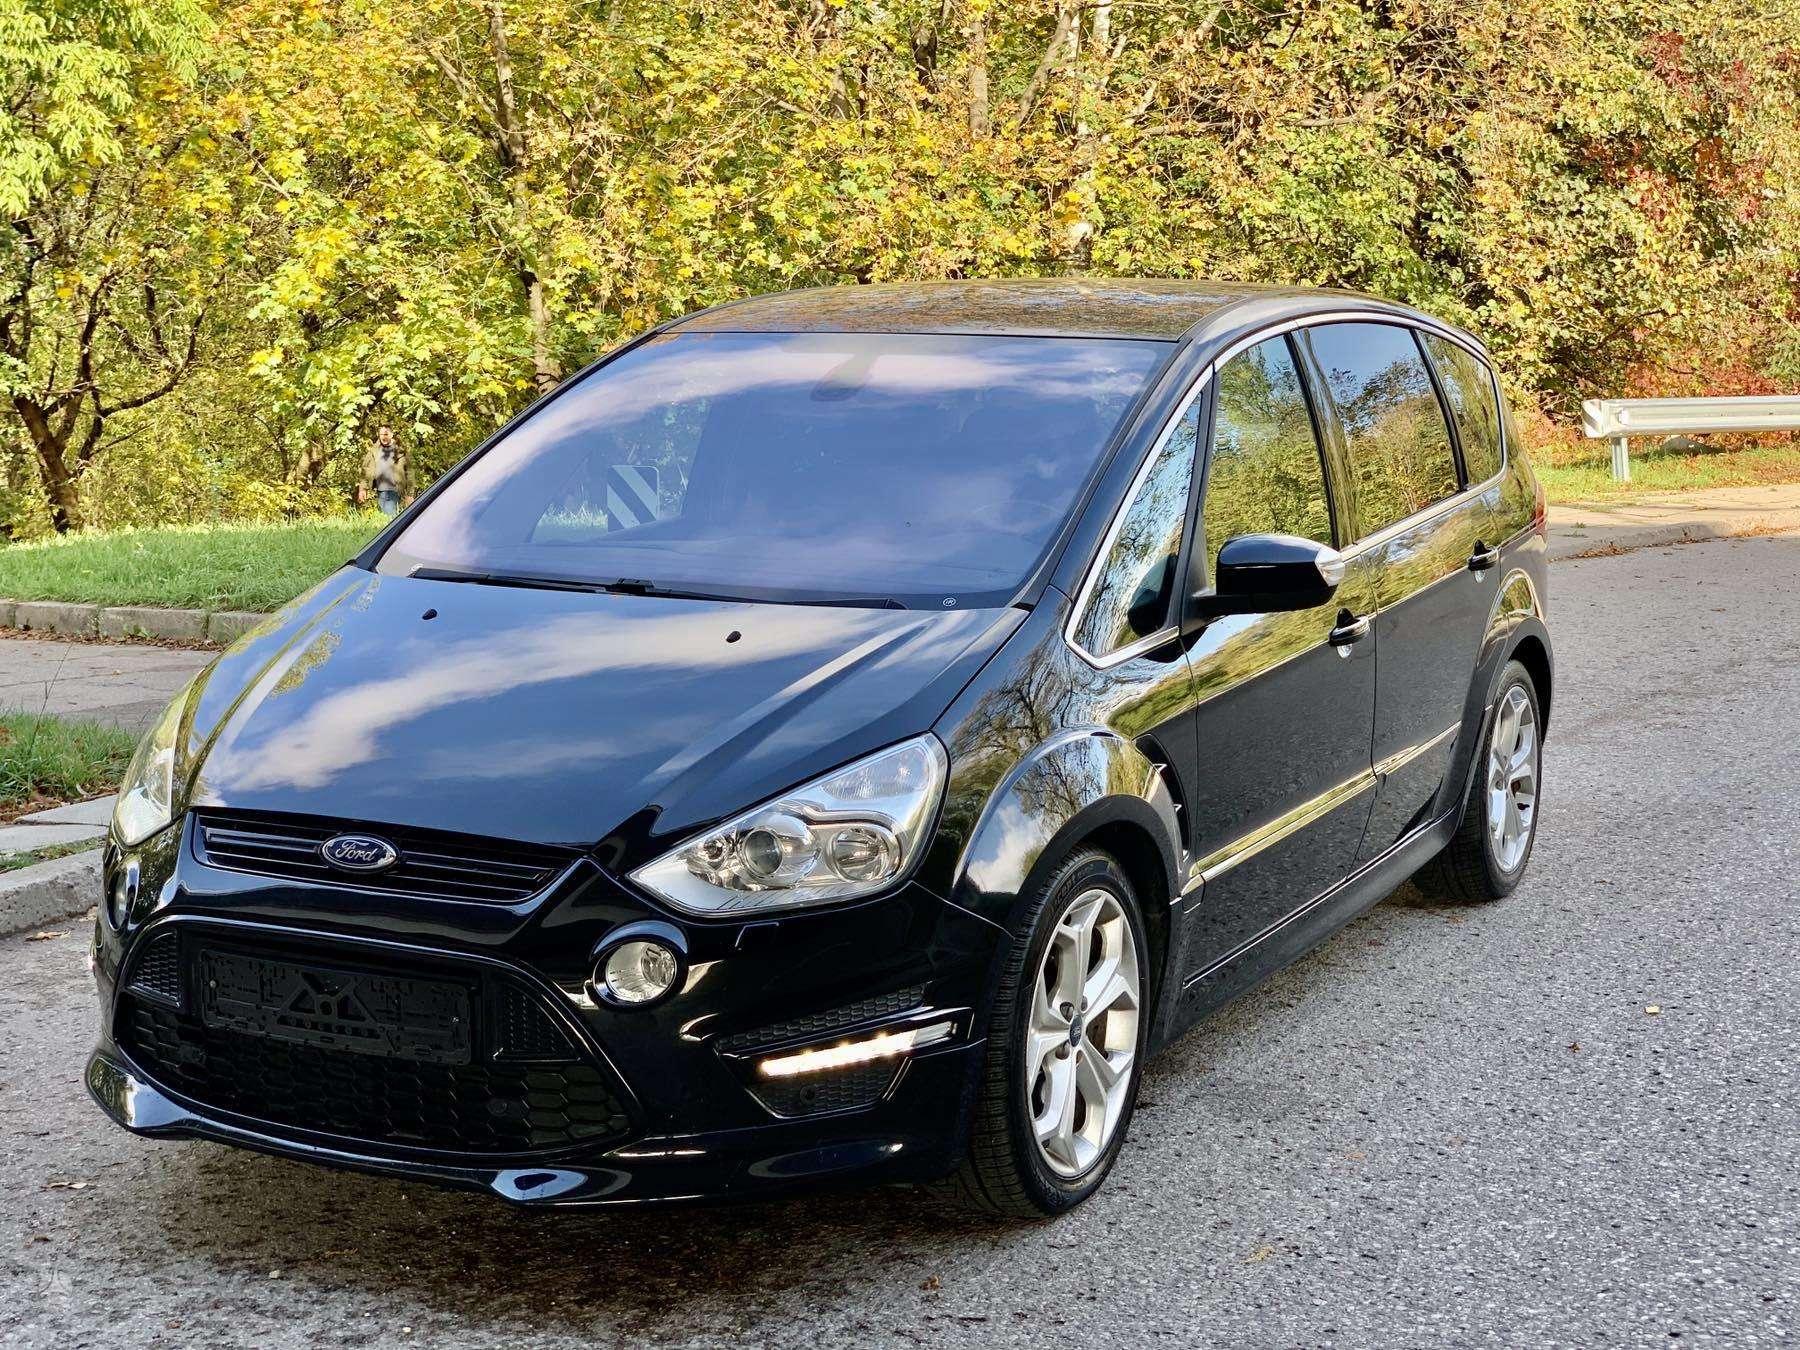 Ford S-MAX, 2.0 l., vienatūris